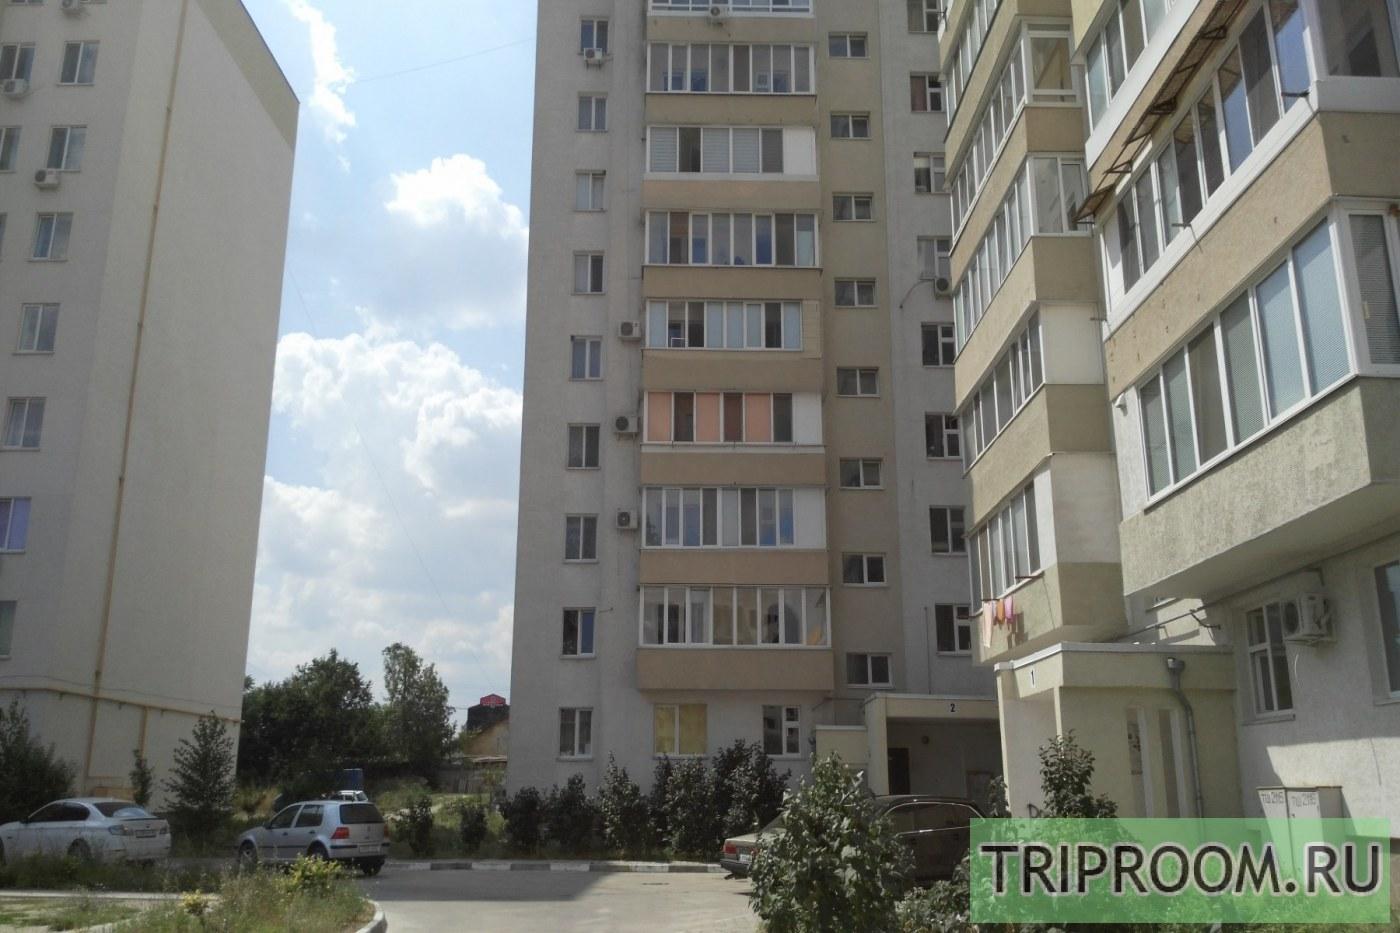 1-комнатная квартира посуточно (вариант № 38995), ул. Лексина улица, фото № 9